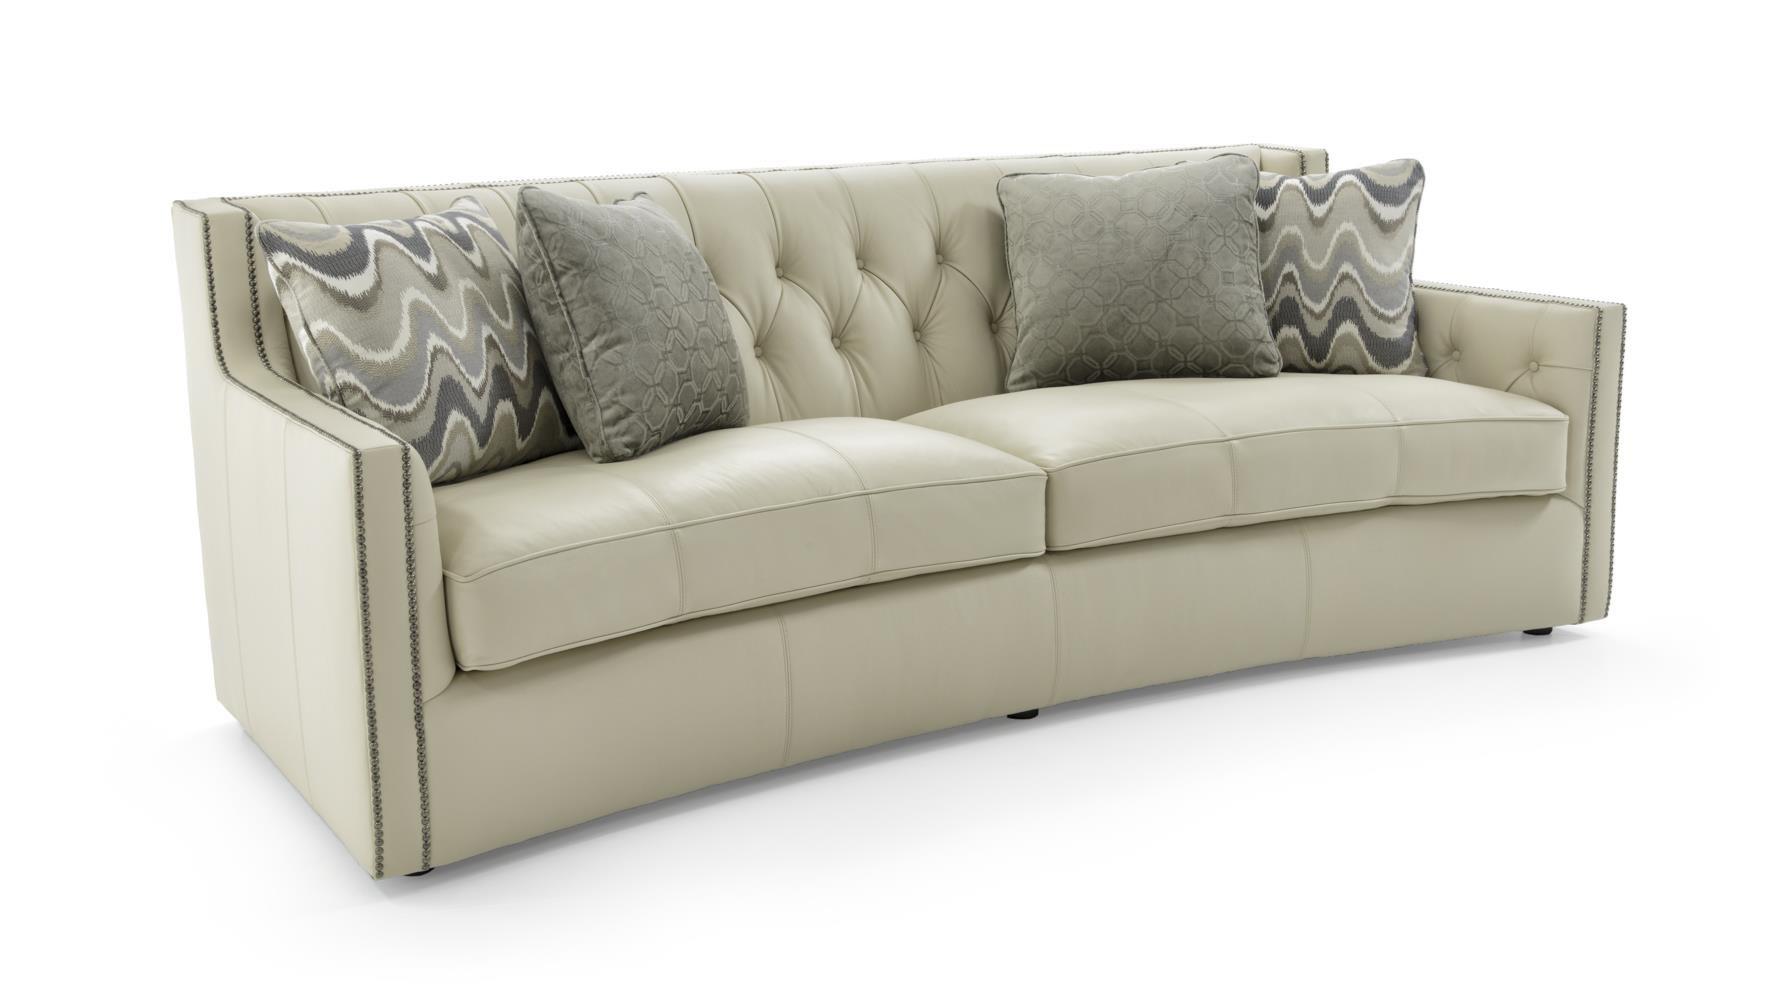 Bernhardt sofas on sale for Bernhardt furniture for sale